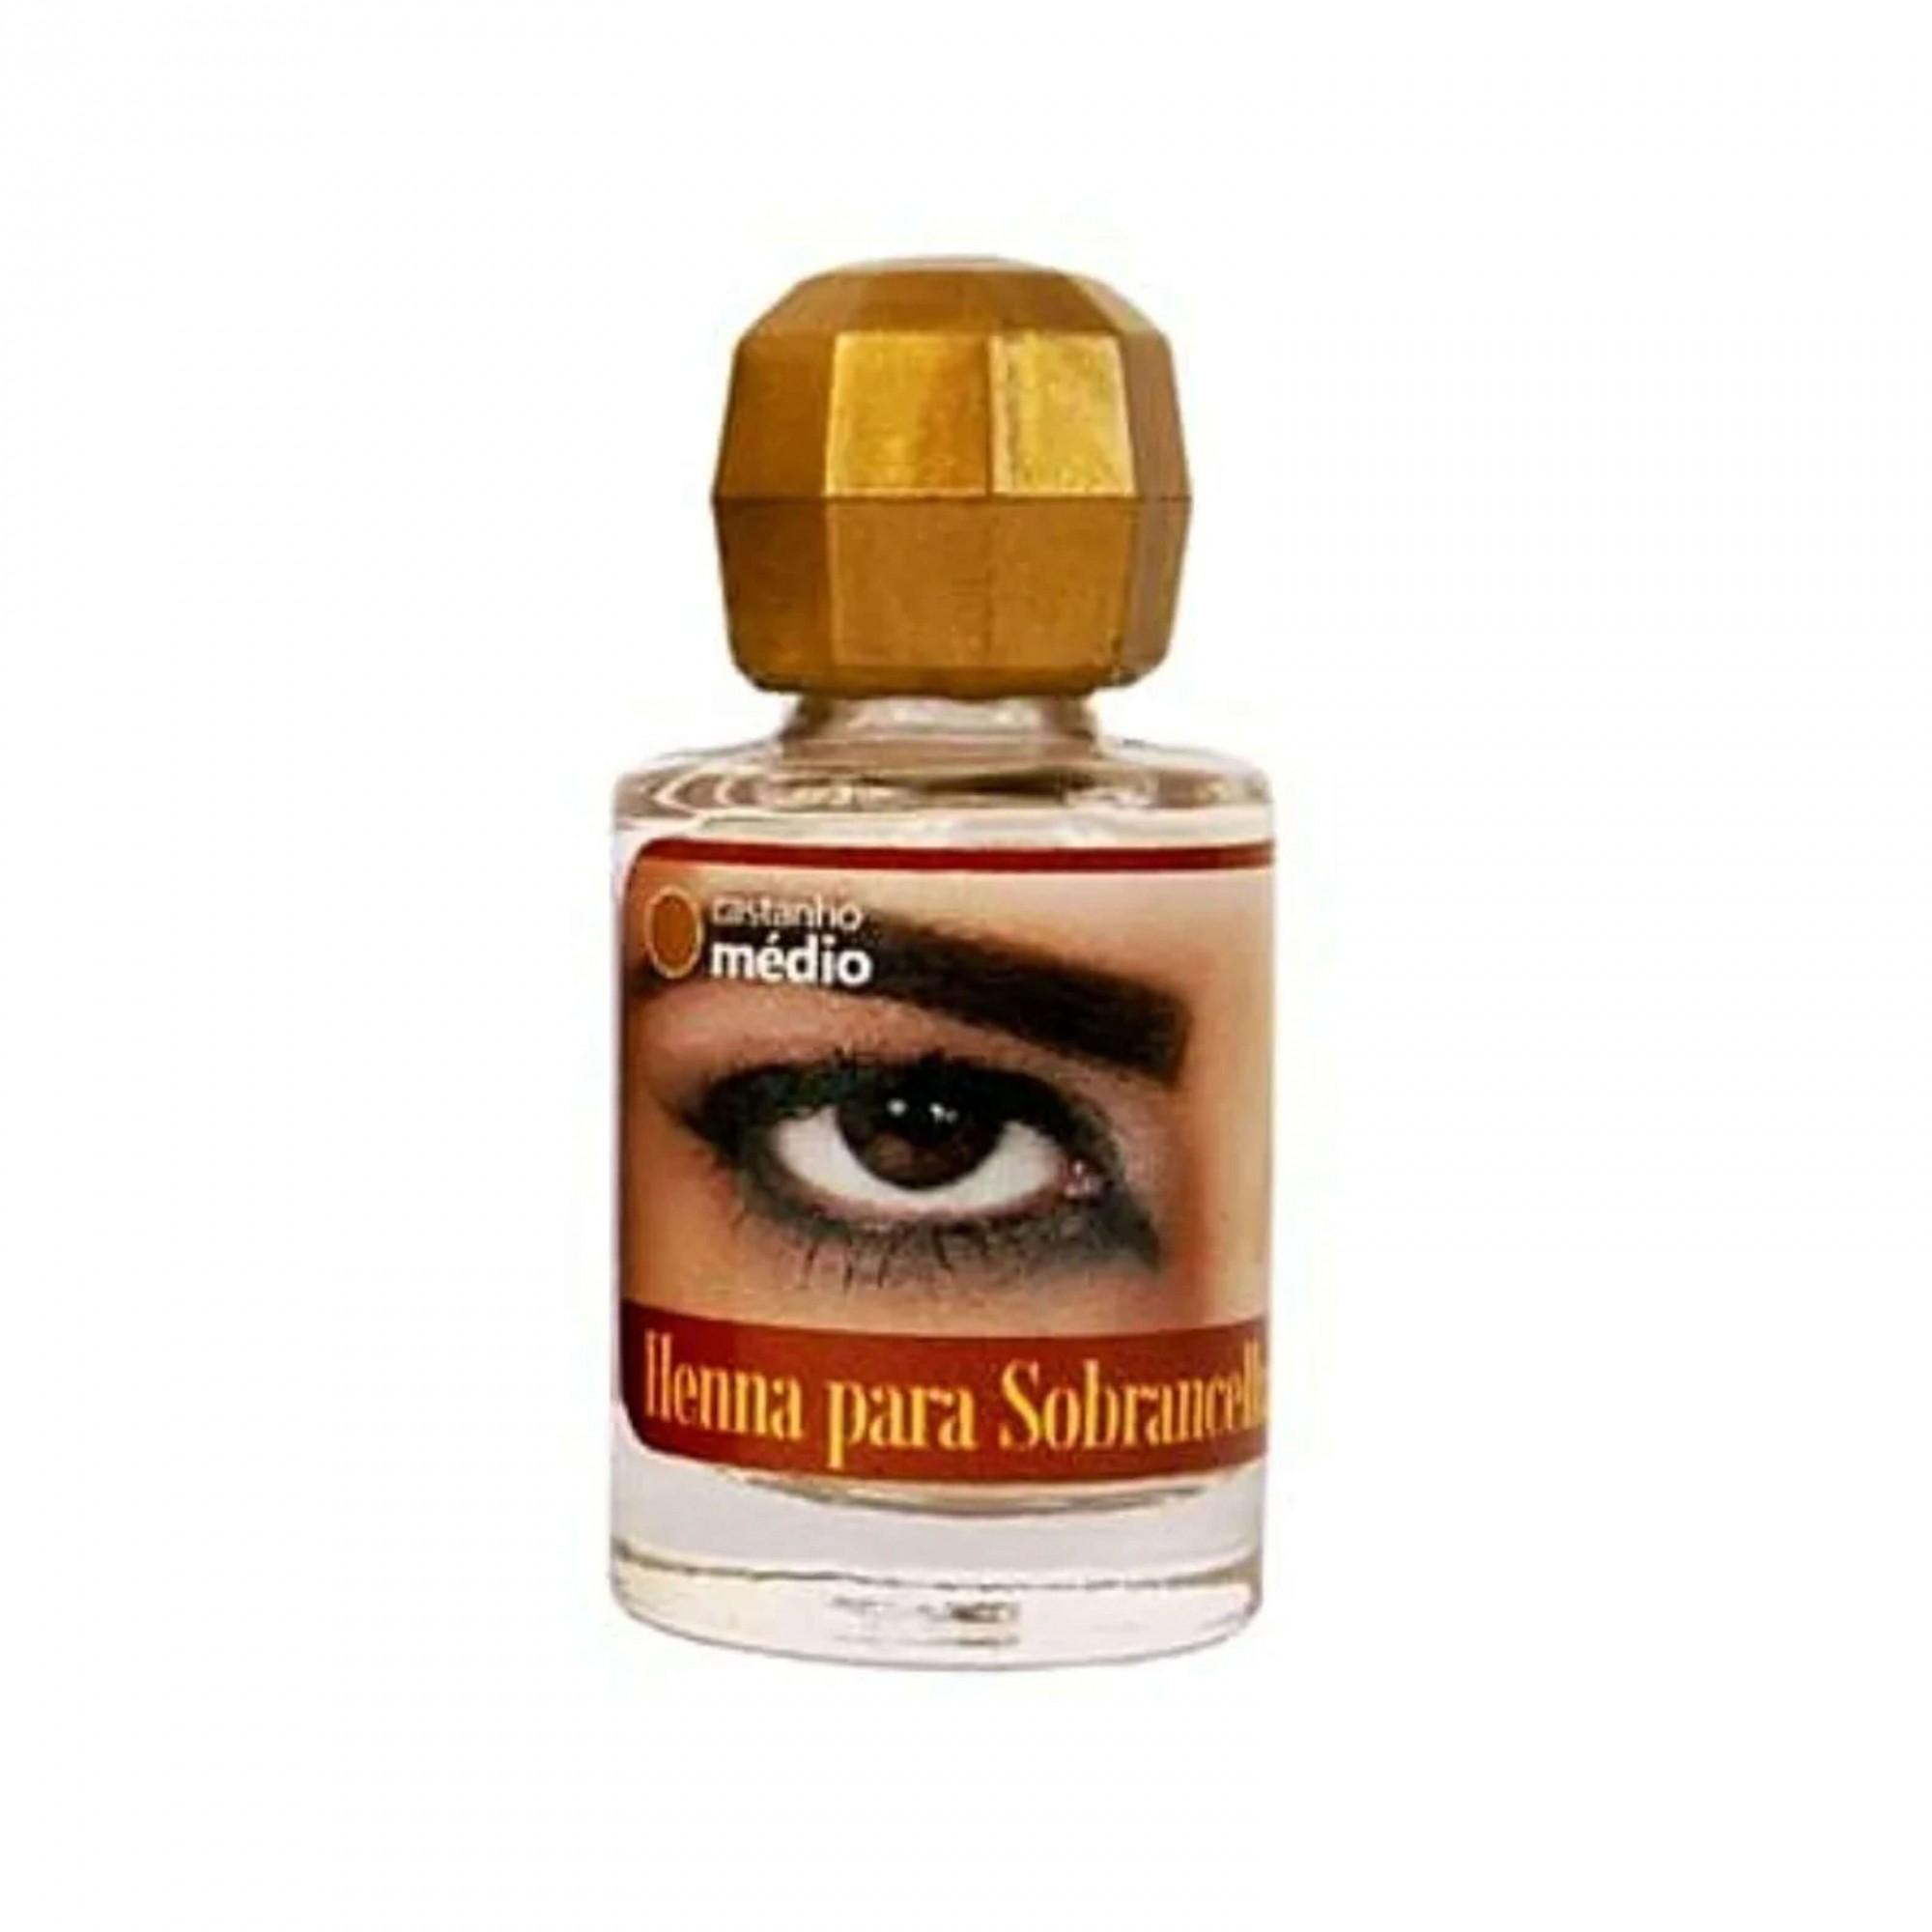 Henna para Sobrancelha Castanho Médio 8g Della Delle